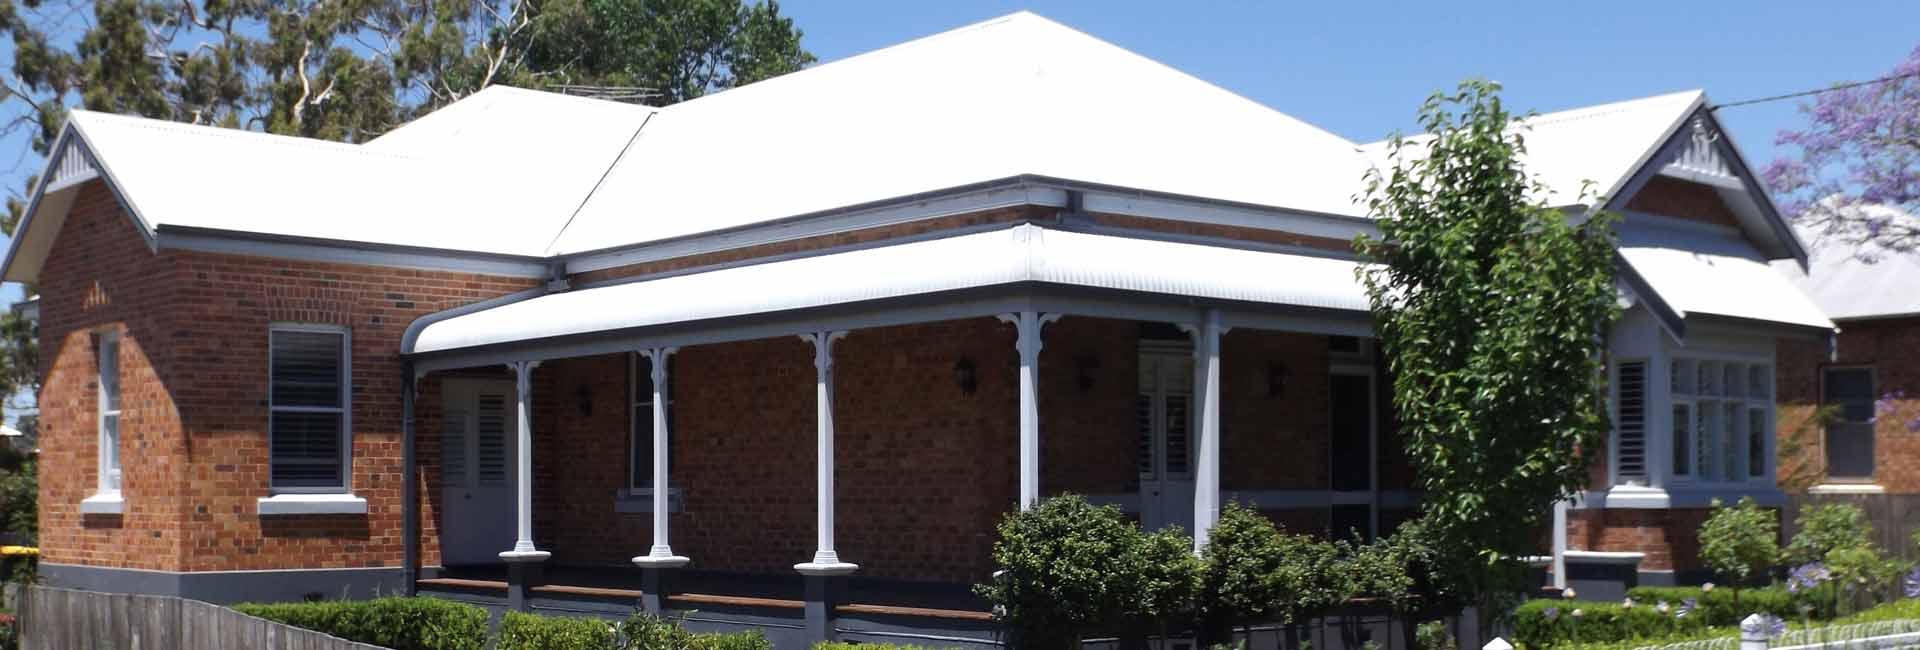 custom-designed-cottage-renovation